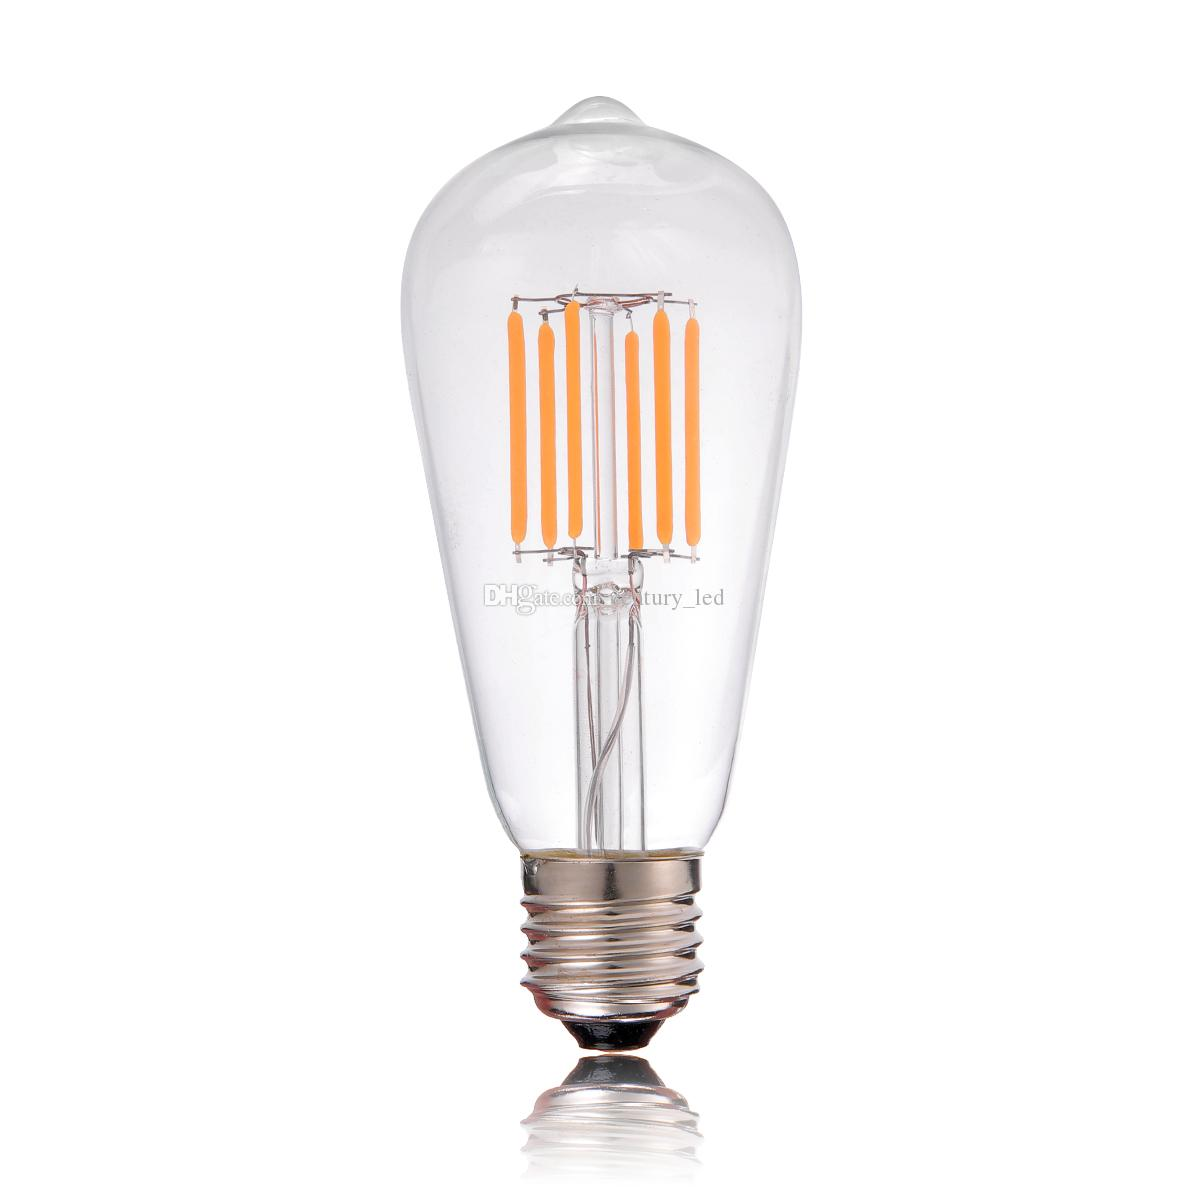 best vintage led filament bulb lightedison st58 style6w 2200ke26 e27 baseretro decorative mr16 led bulb cree led bulbs from centuryled